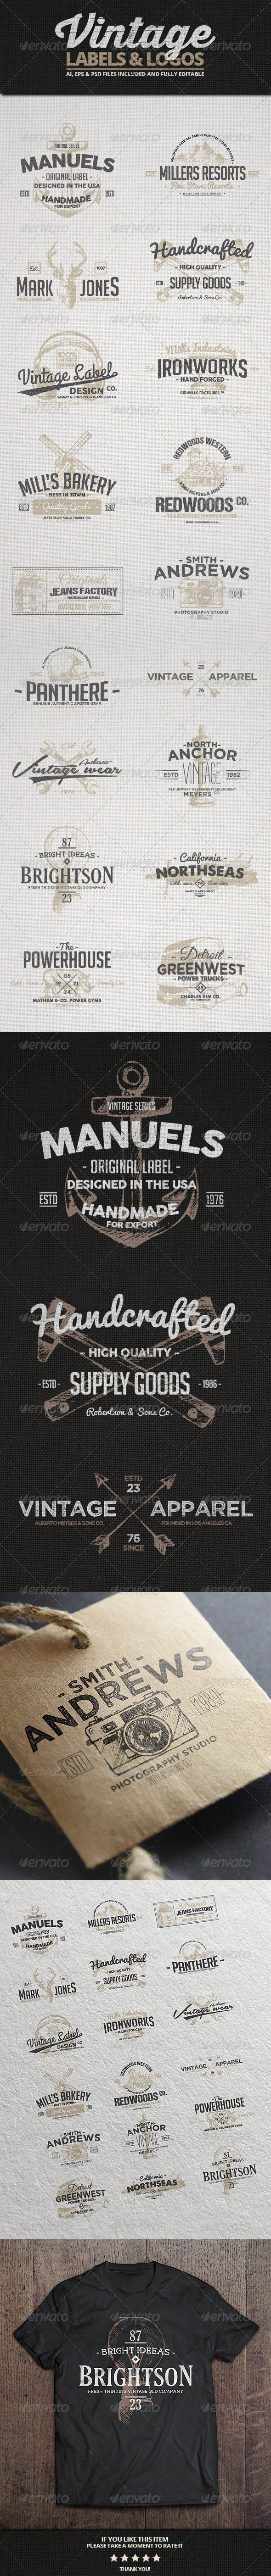 Vintage Labels & Logos Vol.3 - Badges & Stickers Web Elements